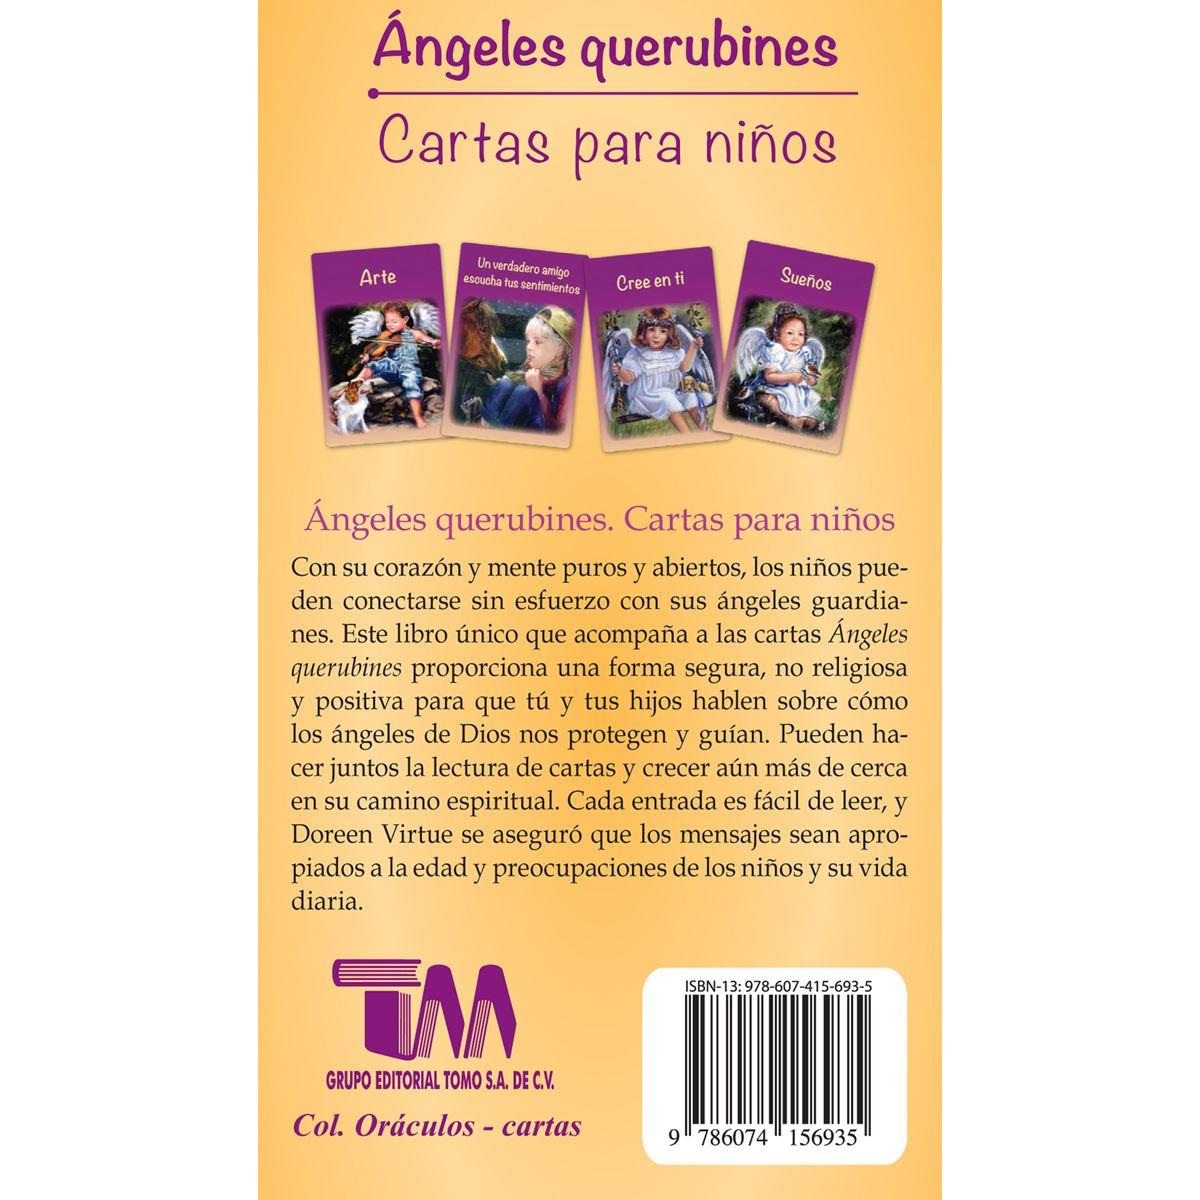 Oráculo ángeles querubines